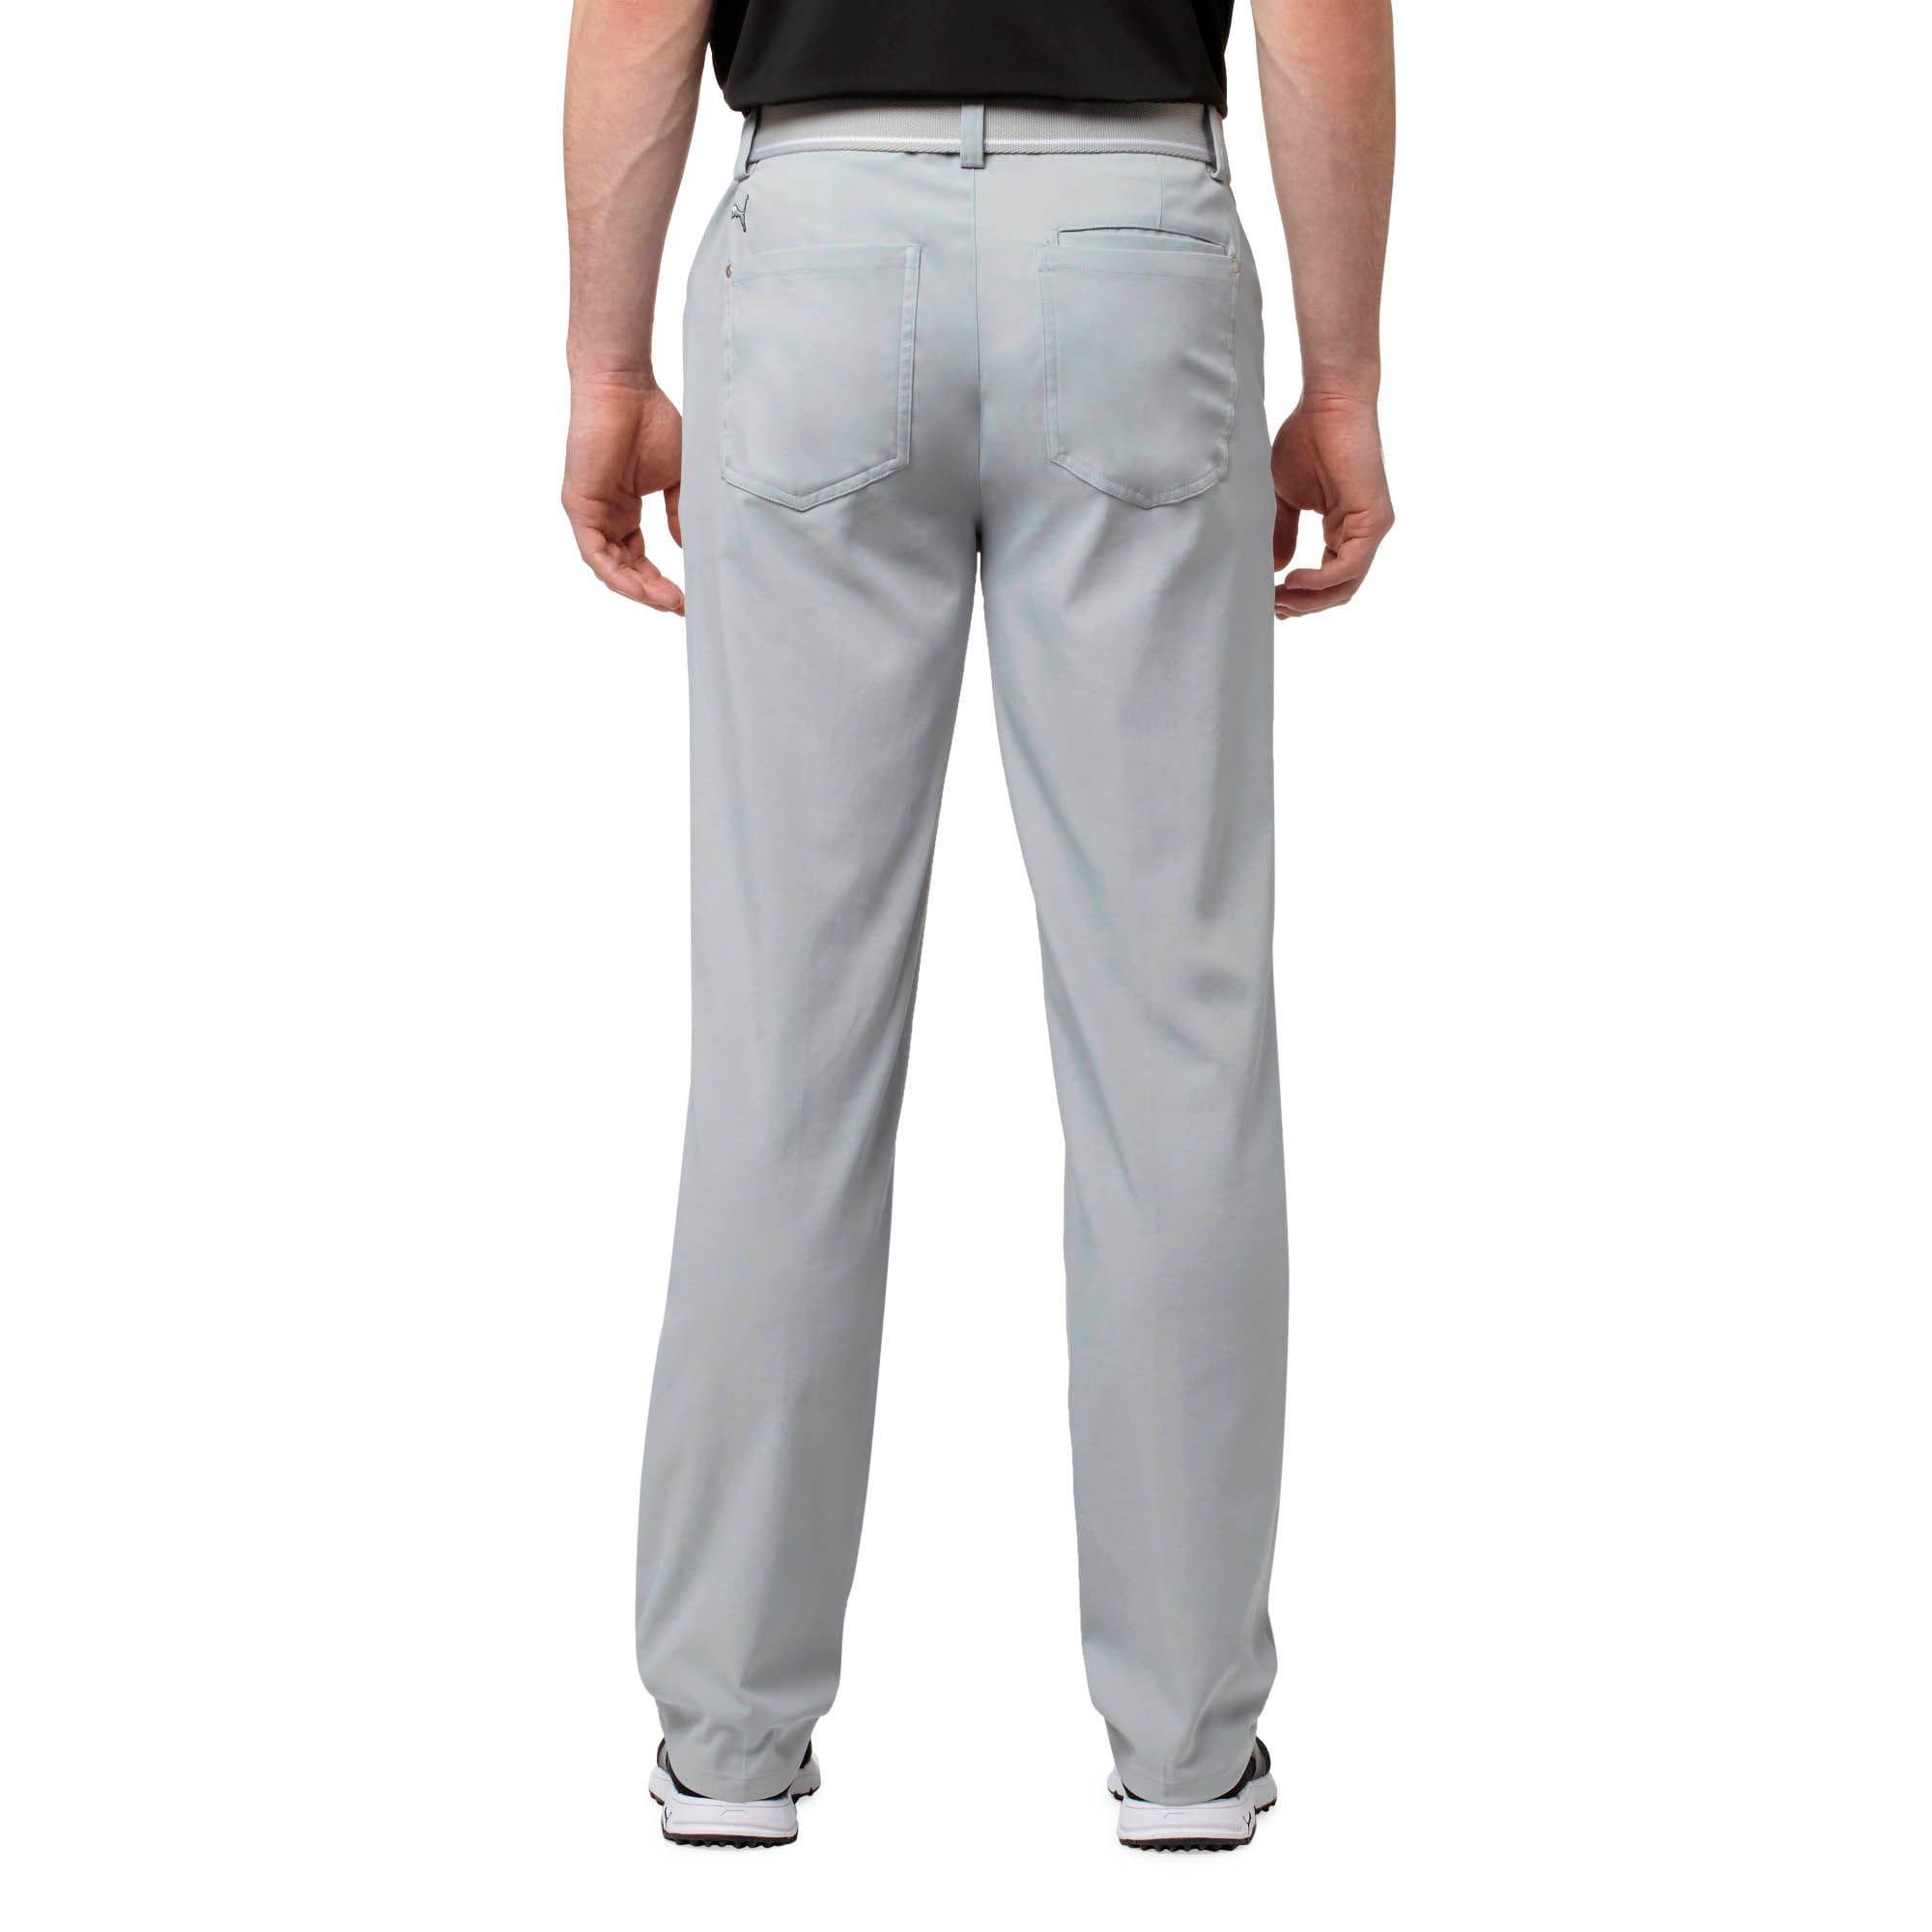 Thumbnail 3 of Men's 6 Pocket Pants, Quarry, medium